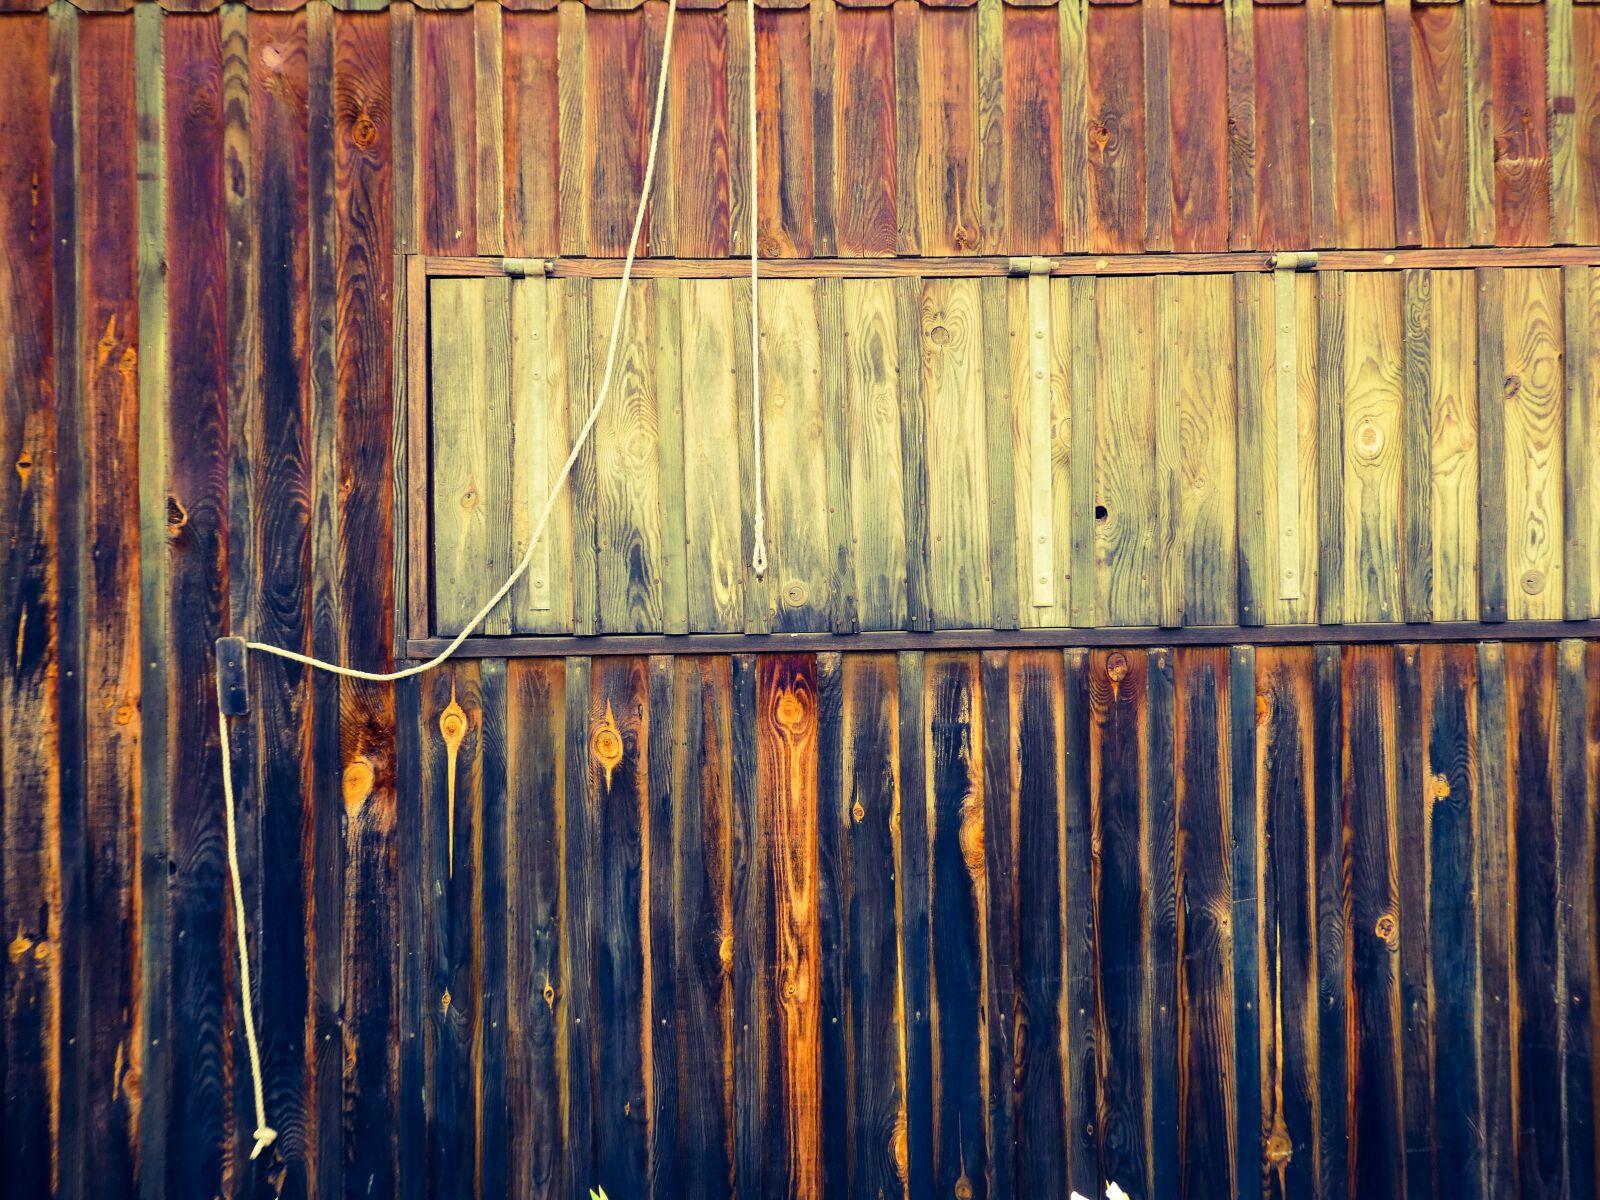 wood, wall, texture